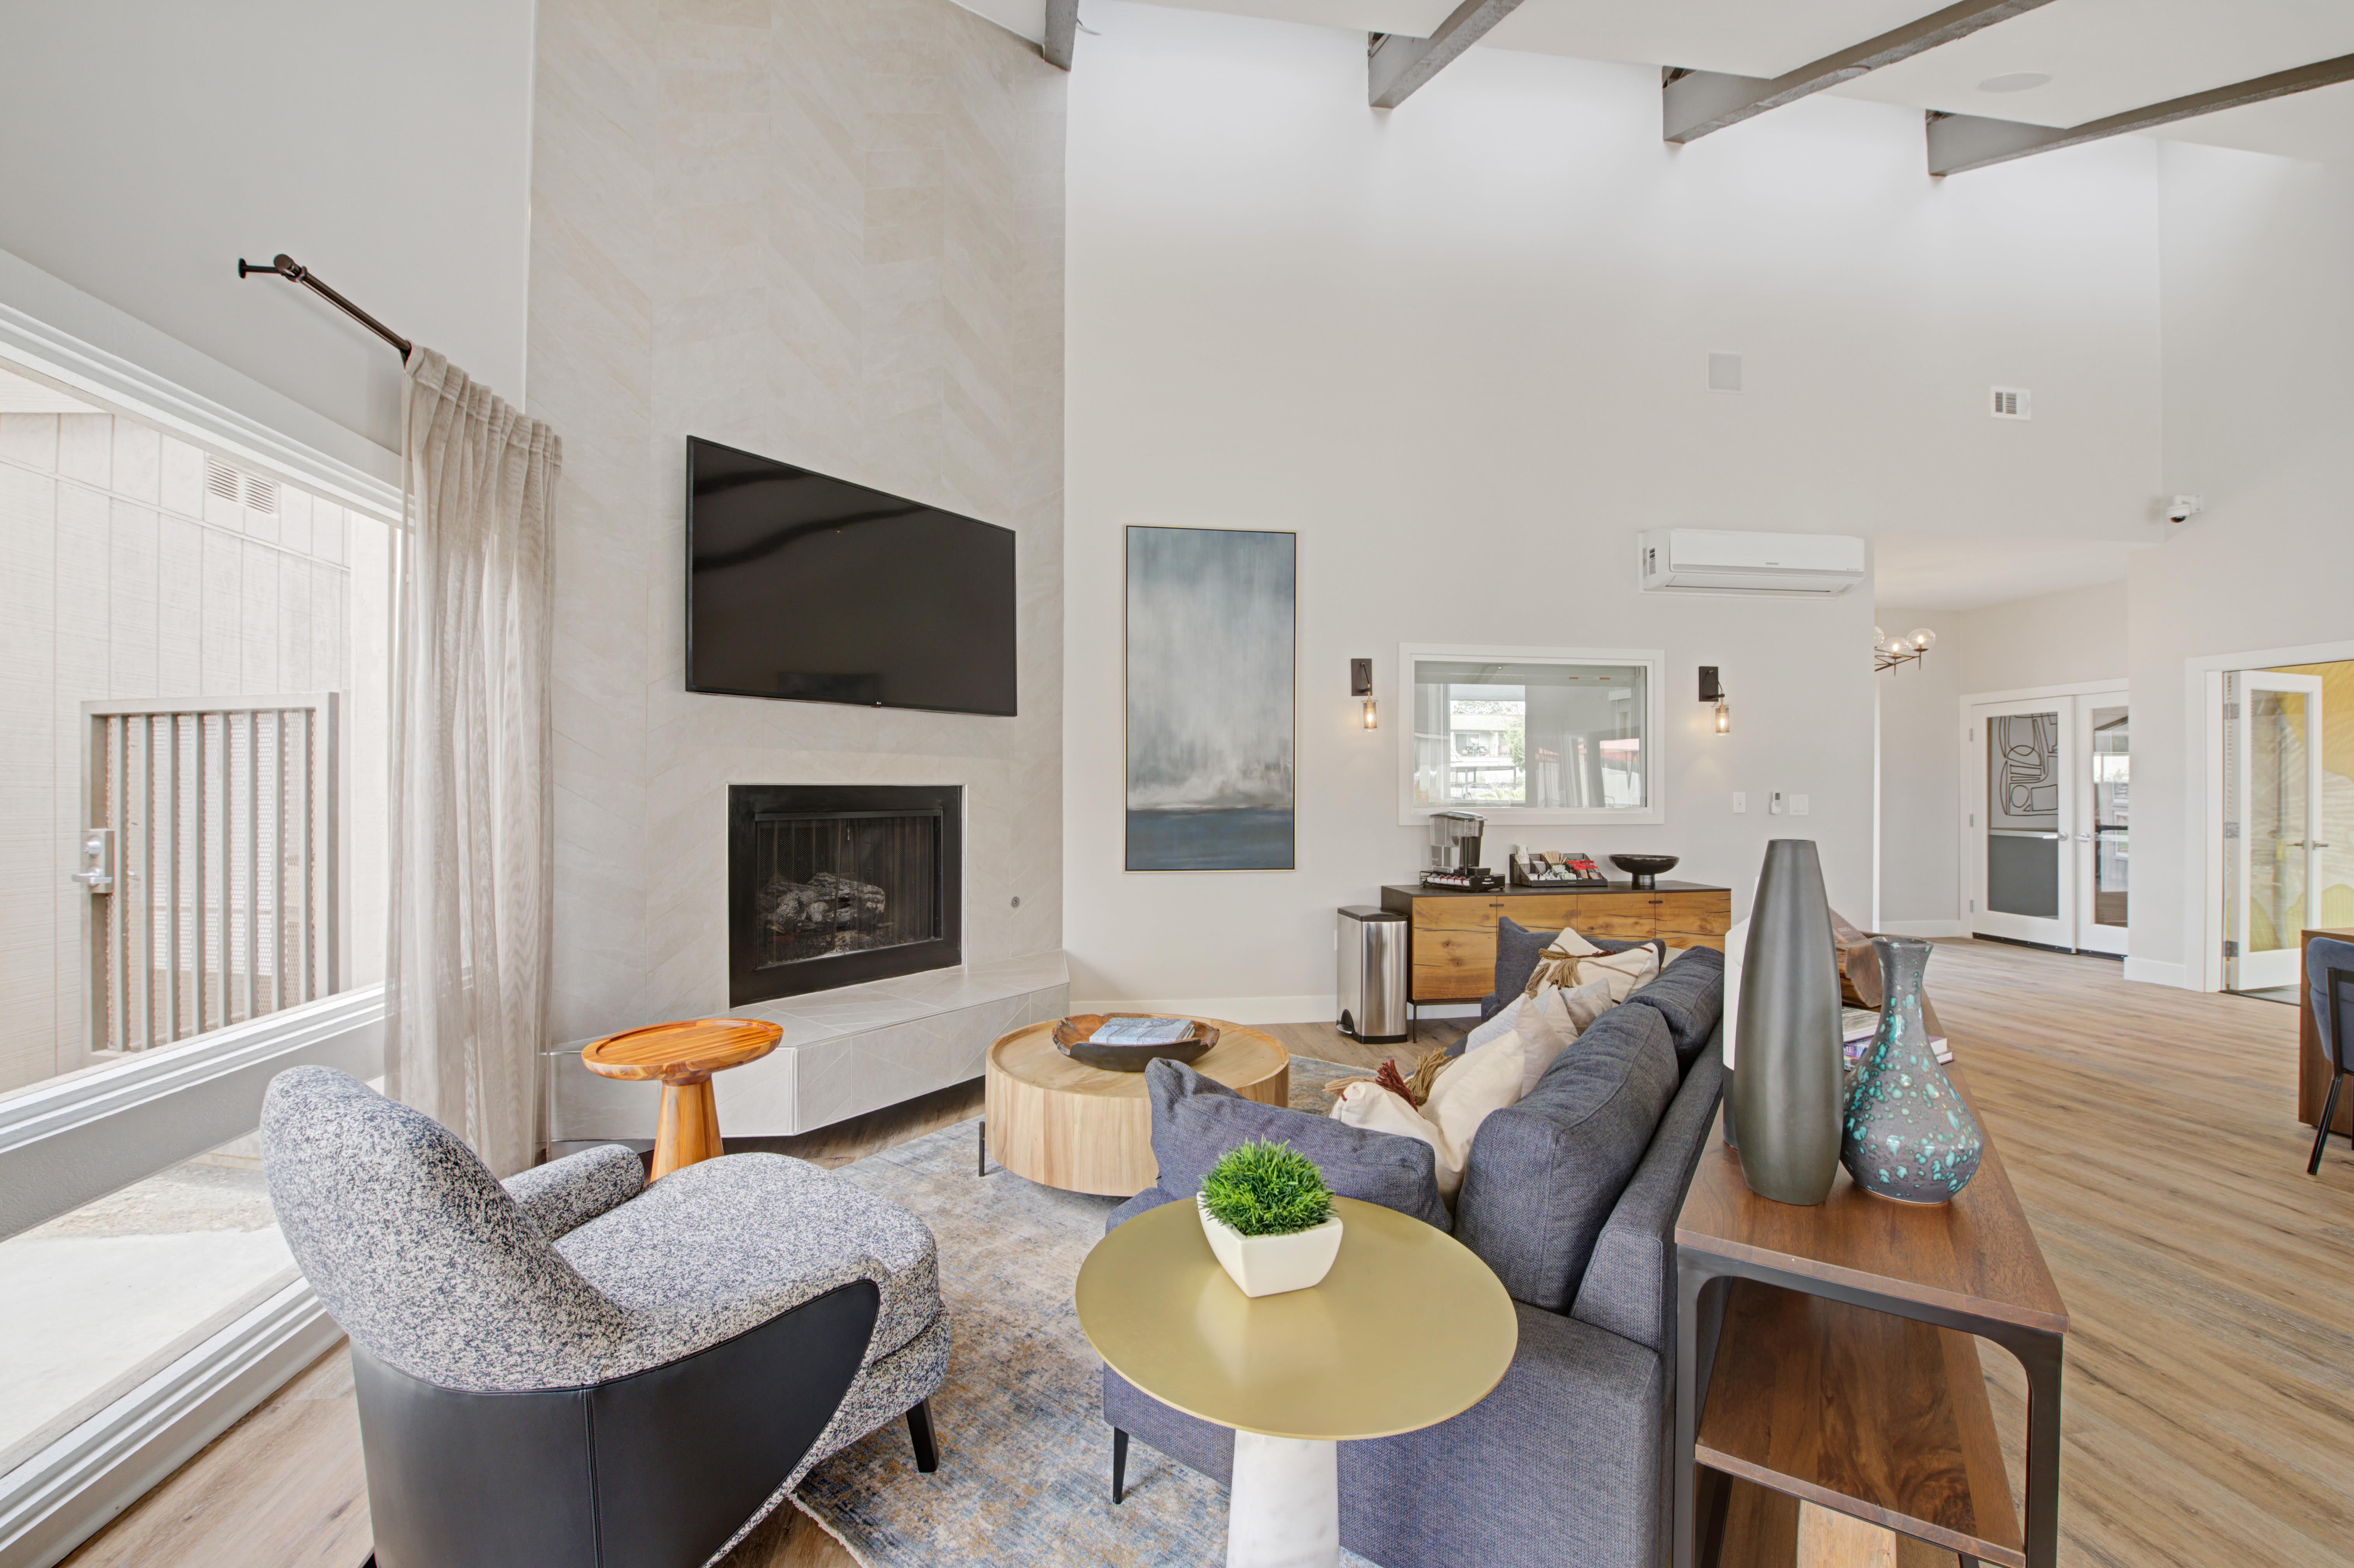 TV lounge area at Sofi Ventura in Ventura, California